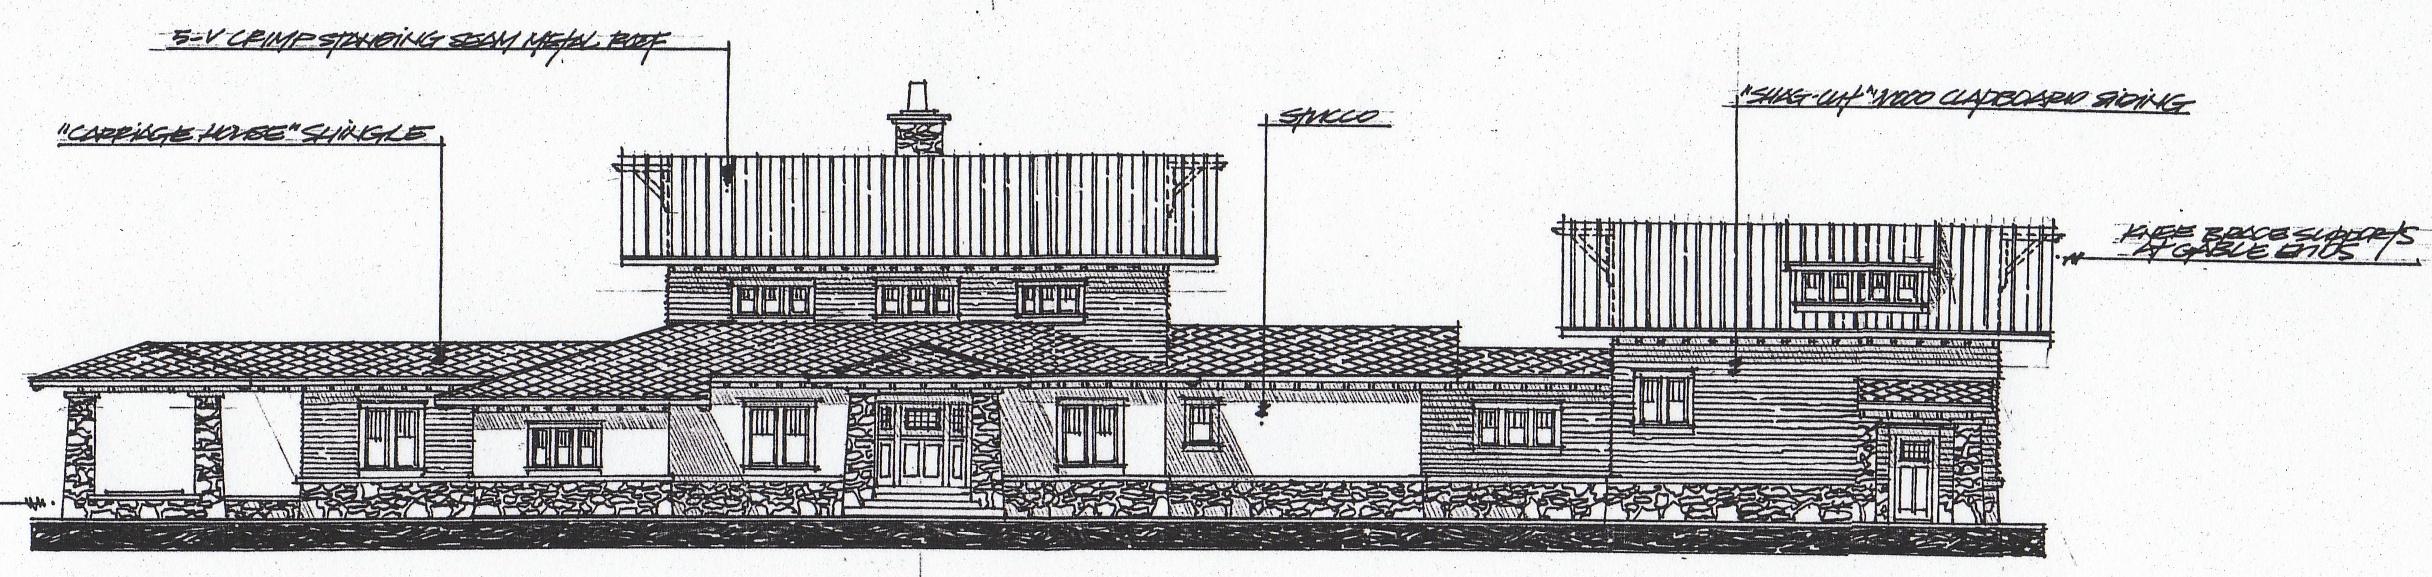 Habayeb-Stewart Residence - Version 3.jpg